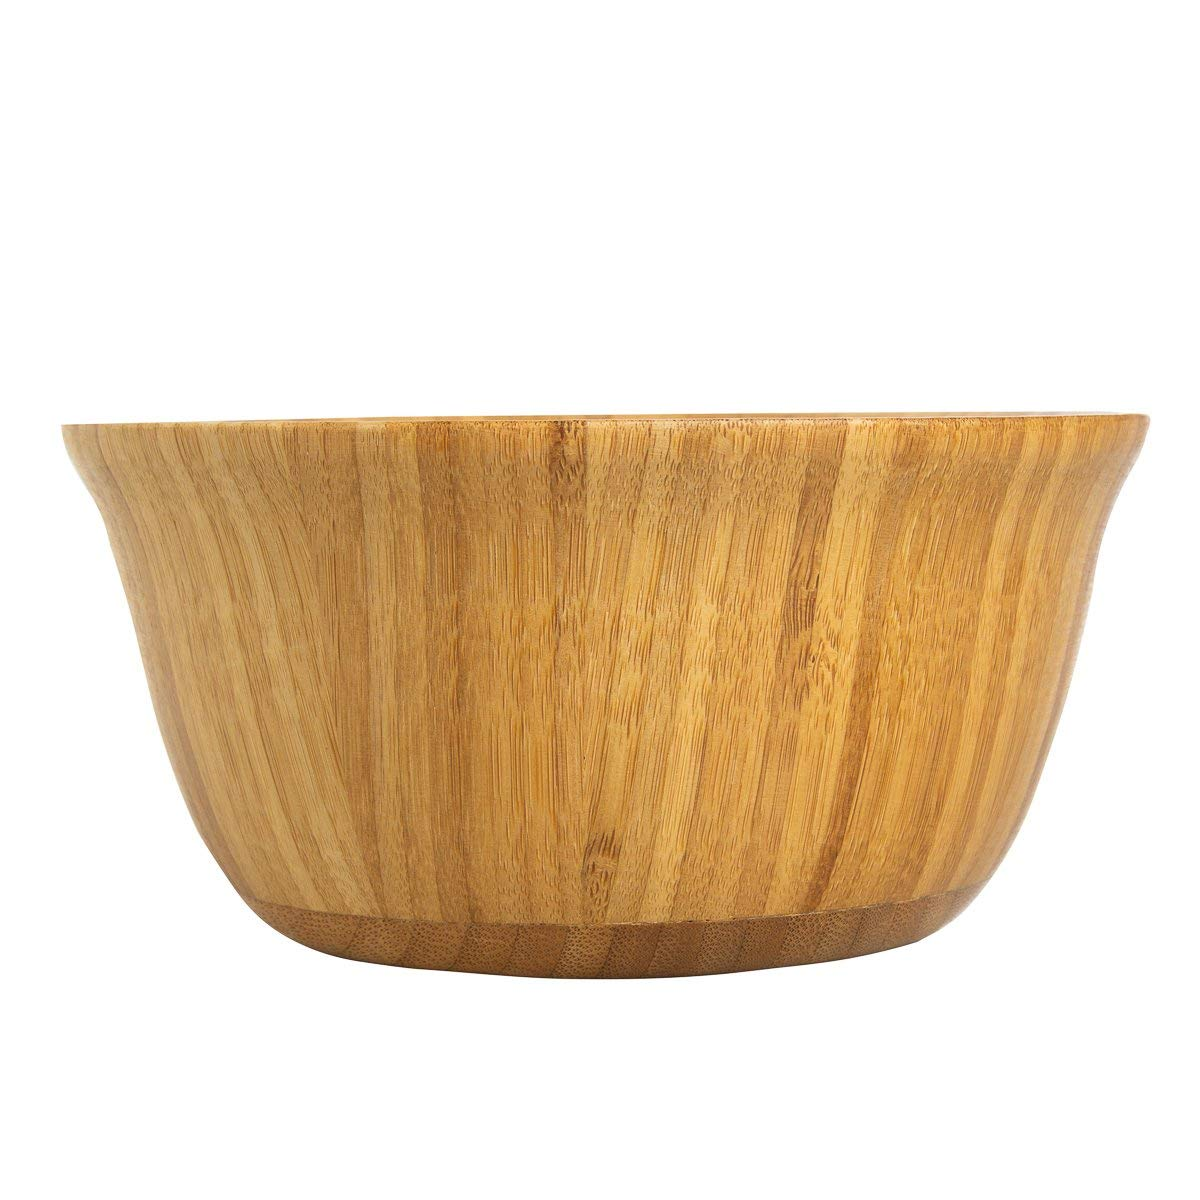 bamboo salad bowl BB-18072903 Details